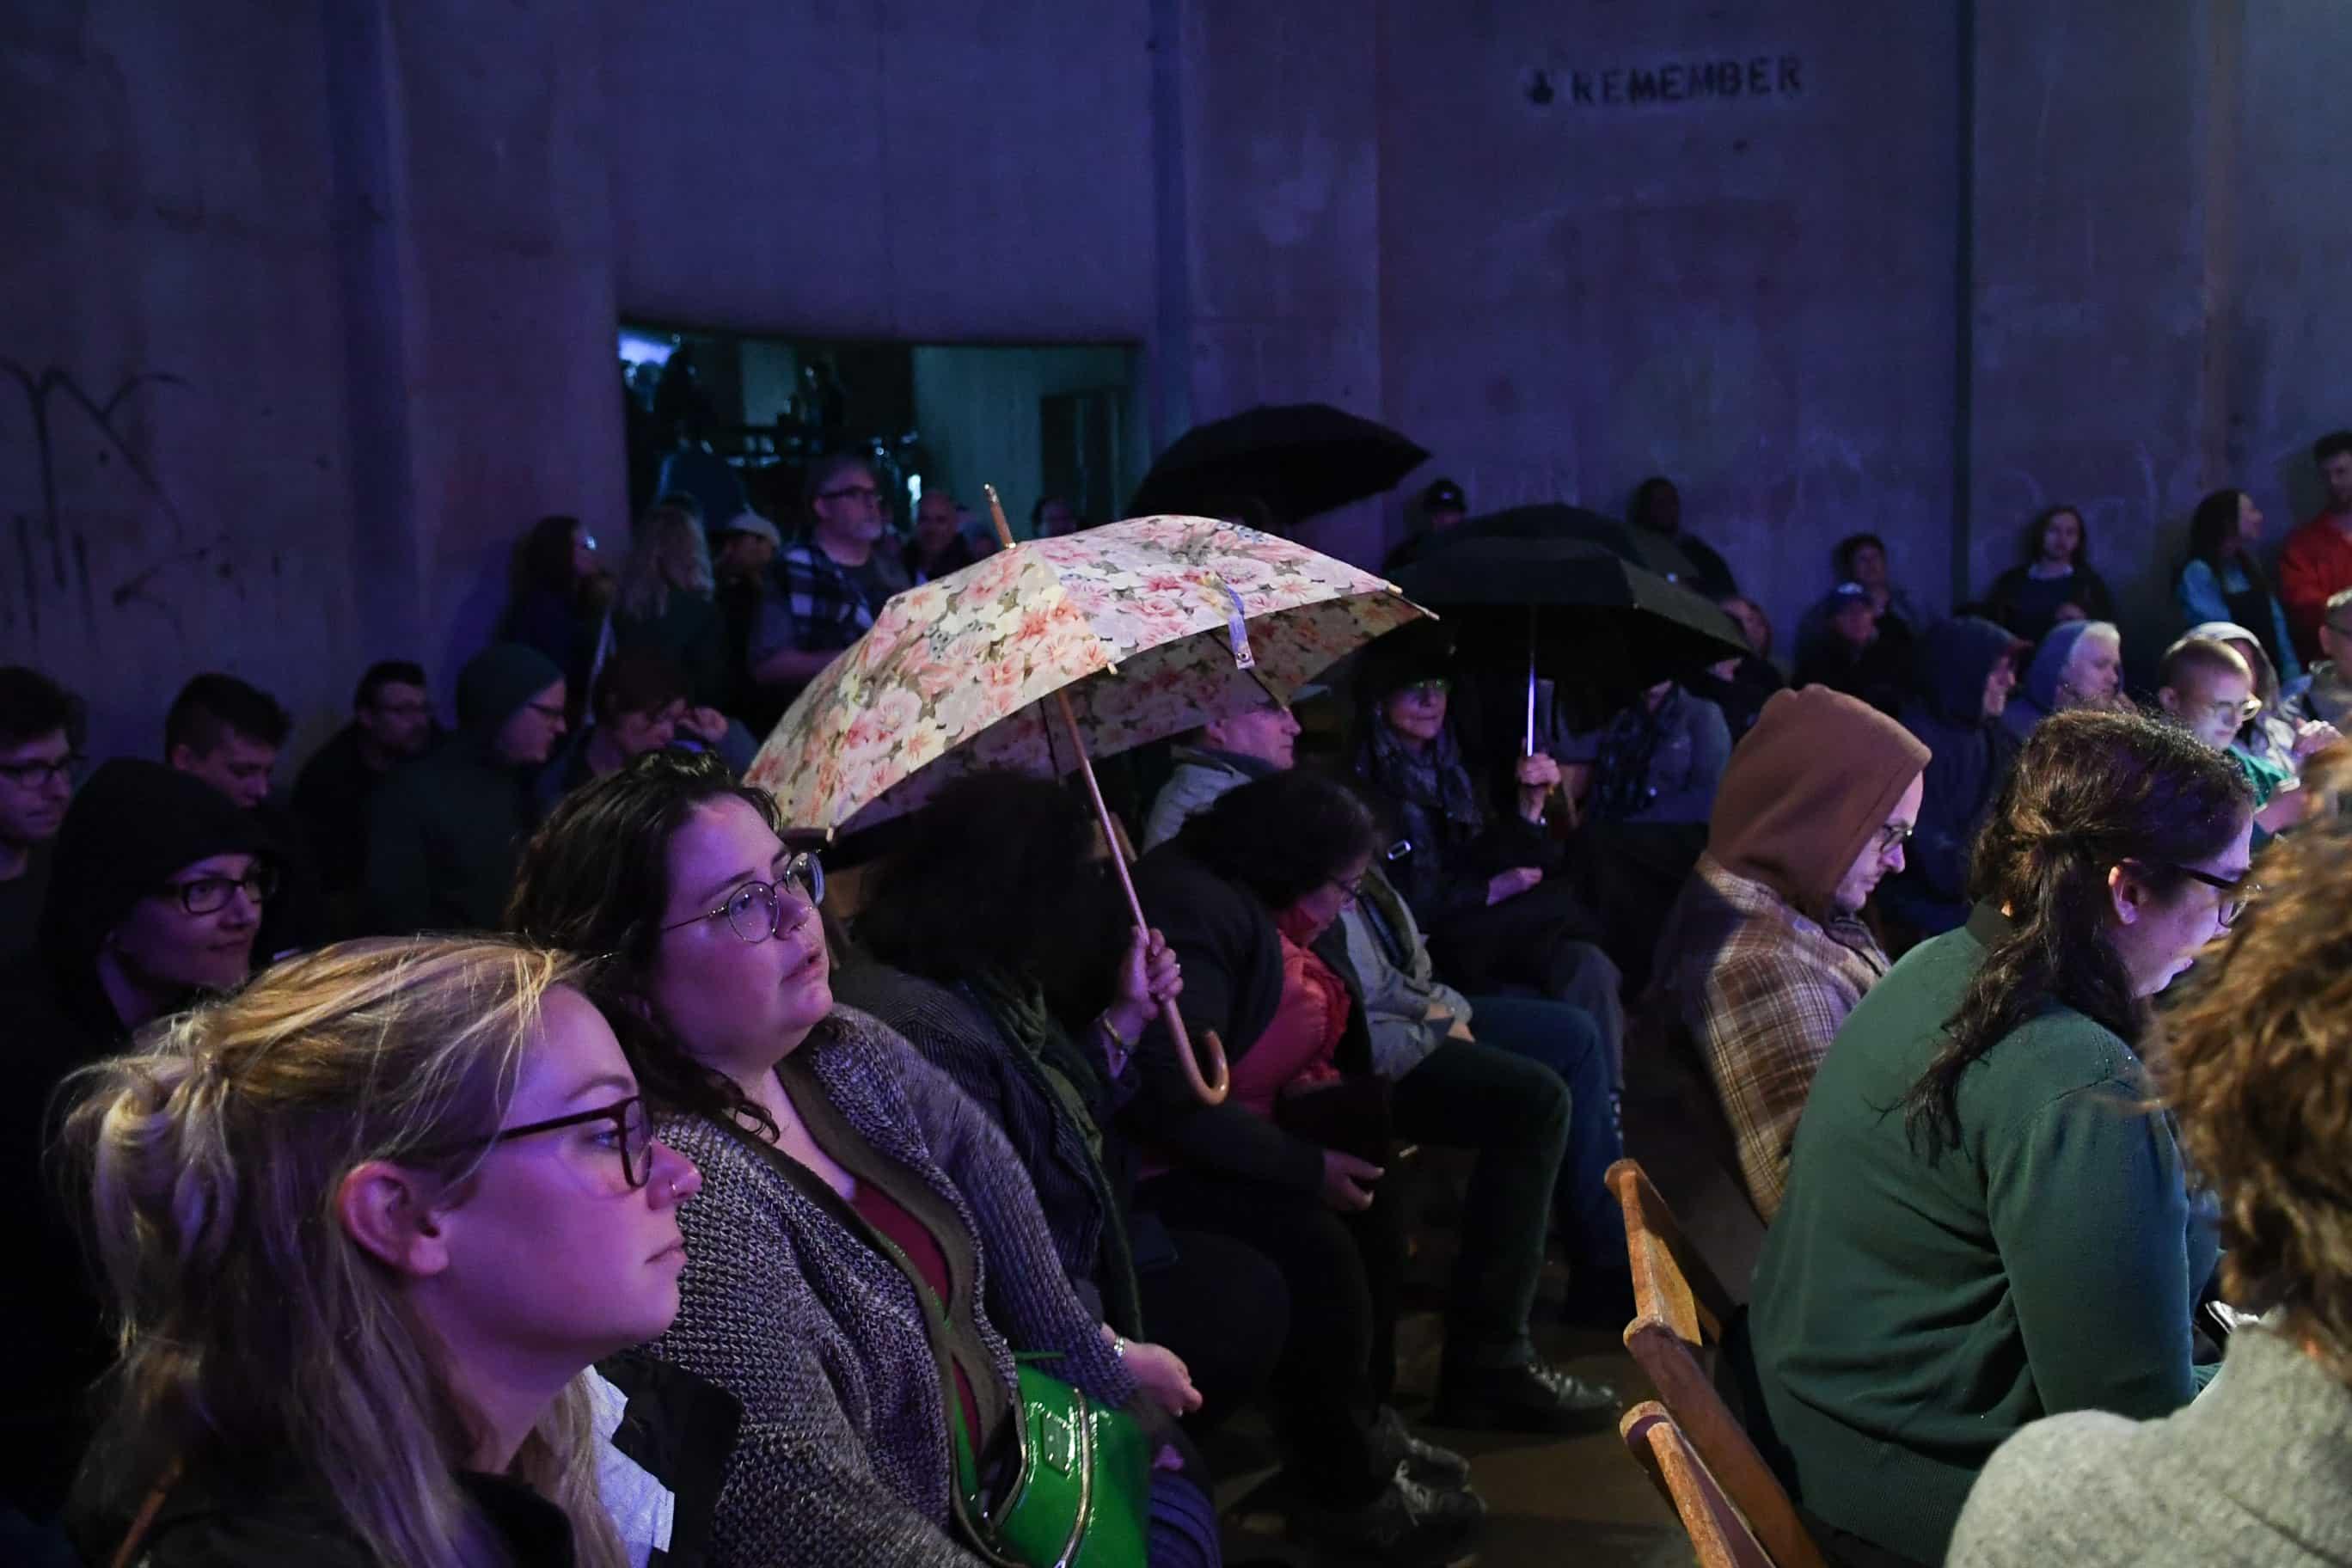 Silo City Reading Series crowd umbrellas